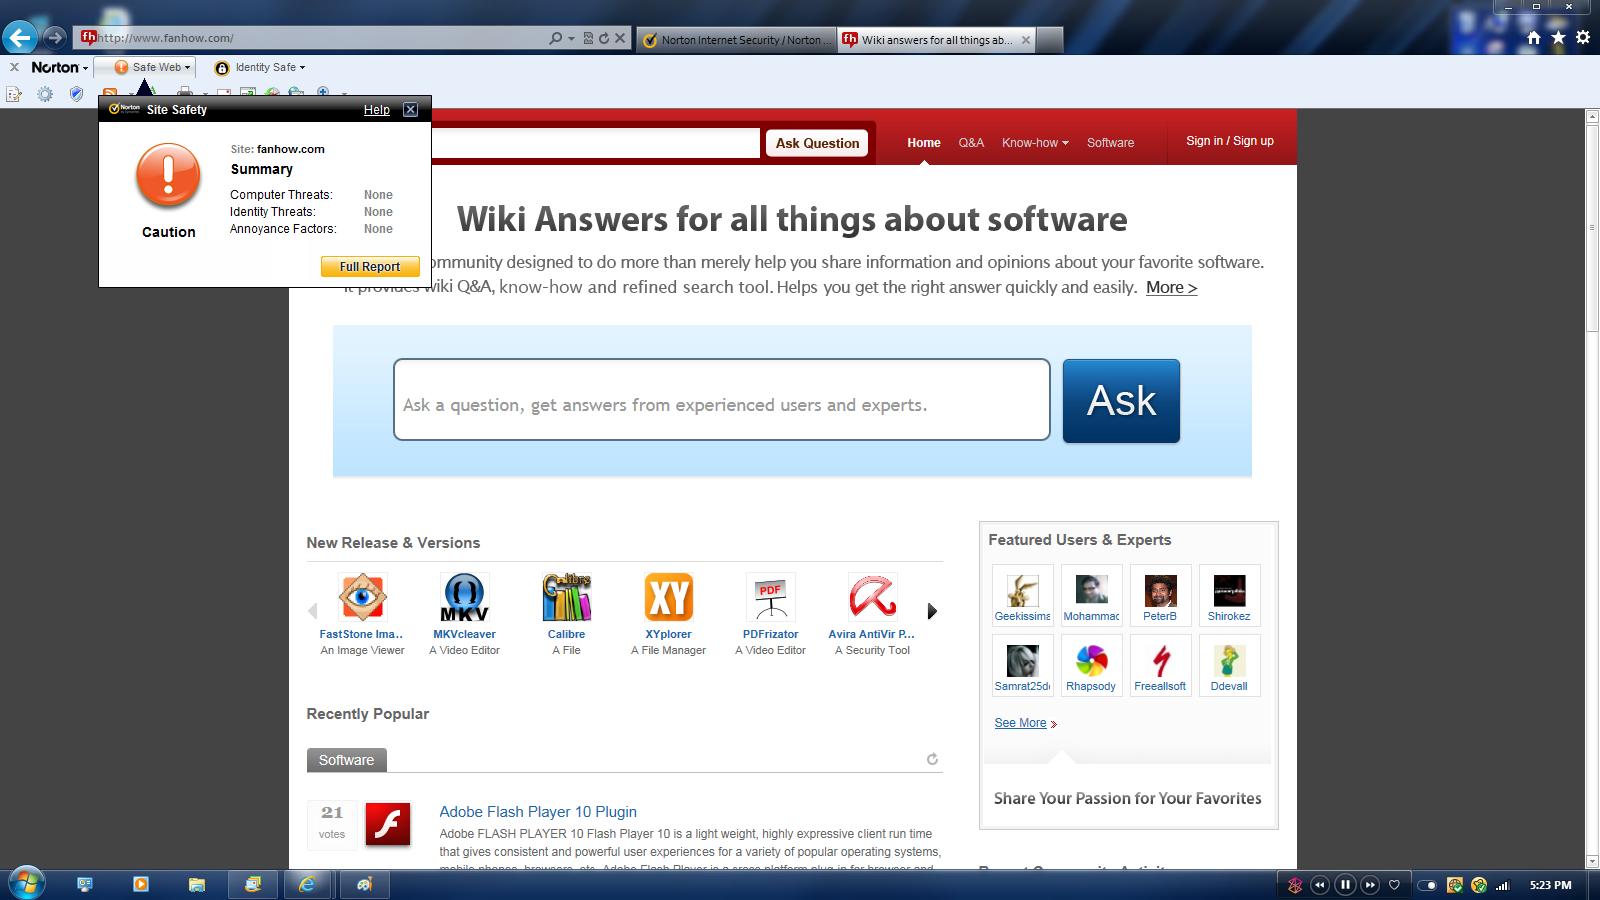 Norton Safeweb Site Rating Vs Nis Toolbar Amp Search